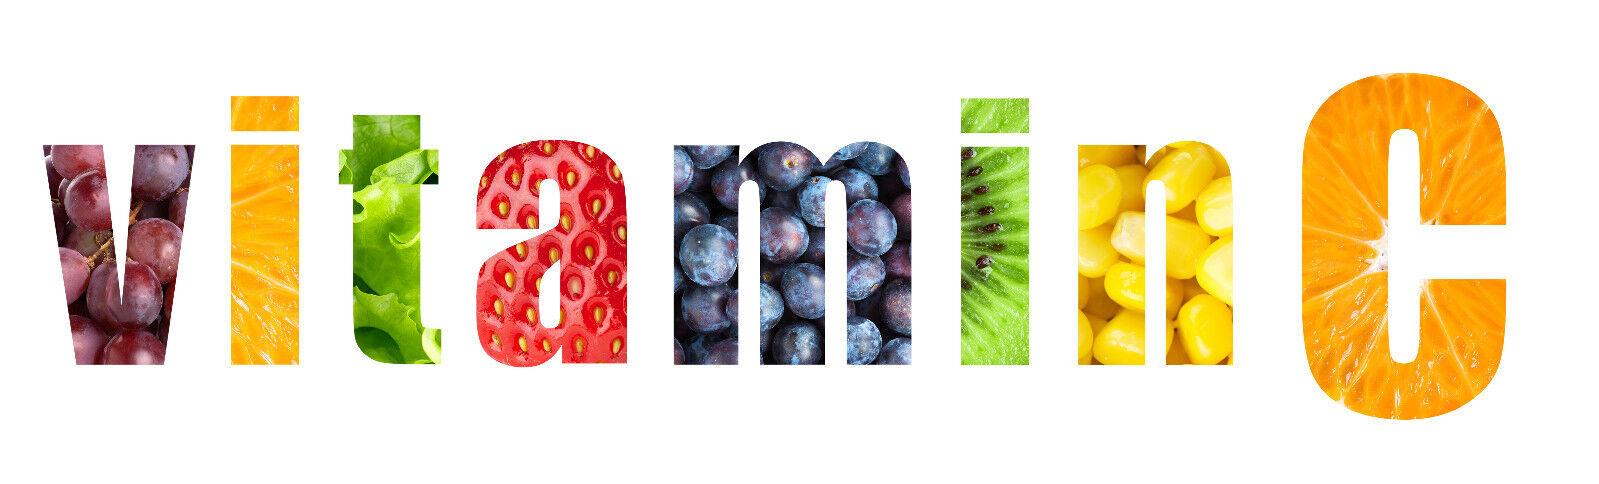 10 x 1 kg Vitamin C Ascorbinsäure E300 Lebensmittelqualität Abwehrkräfte Abwehrkräfte Lebensmittelqualität 10 kg 7ea68b